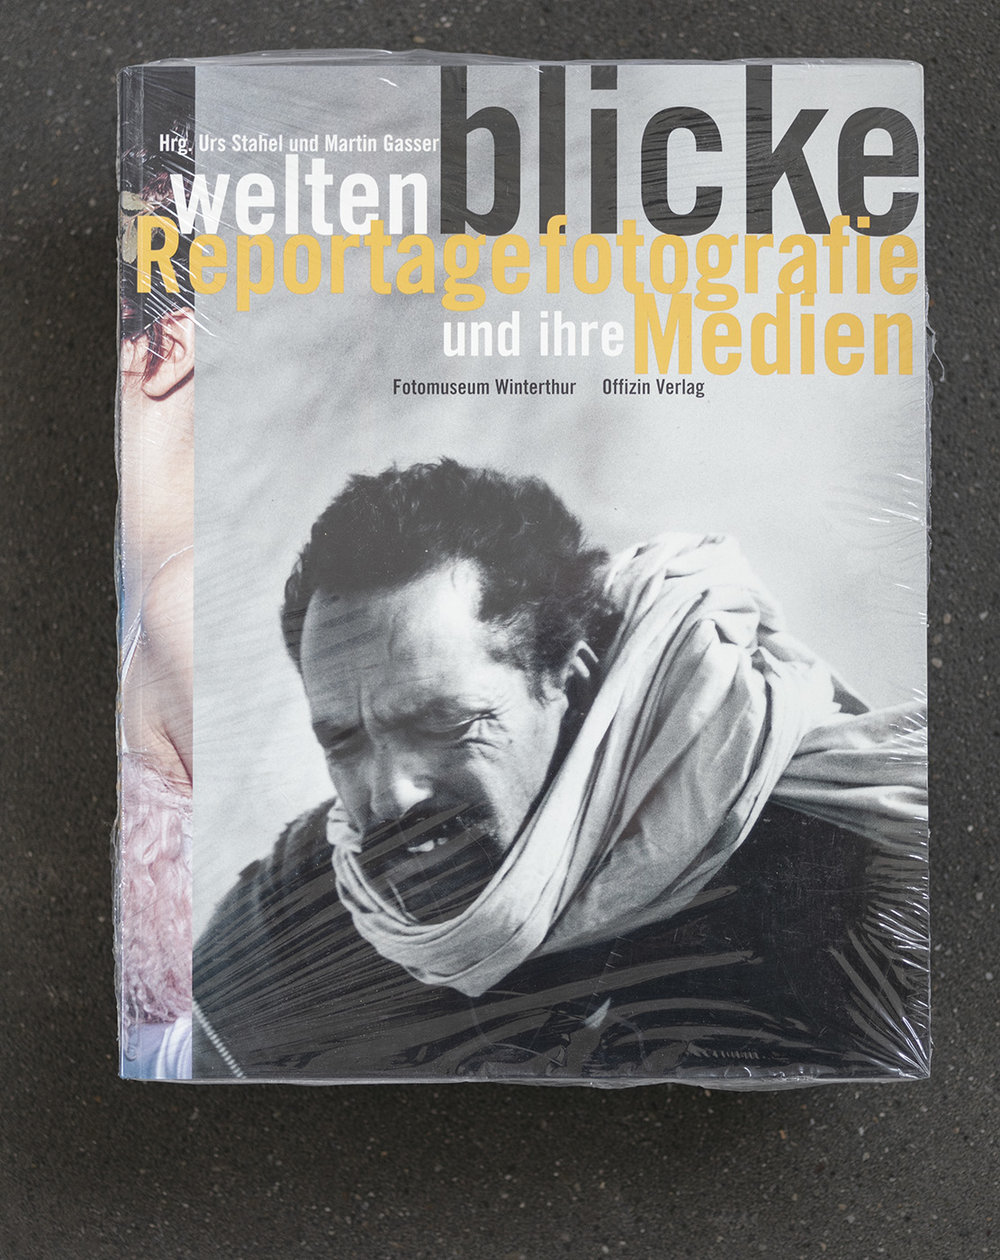 Weltenblicke, exhibition catalogue